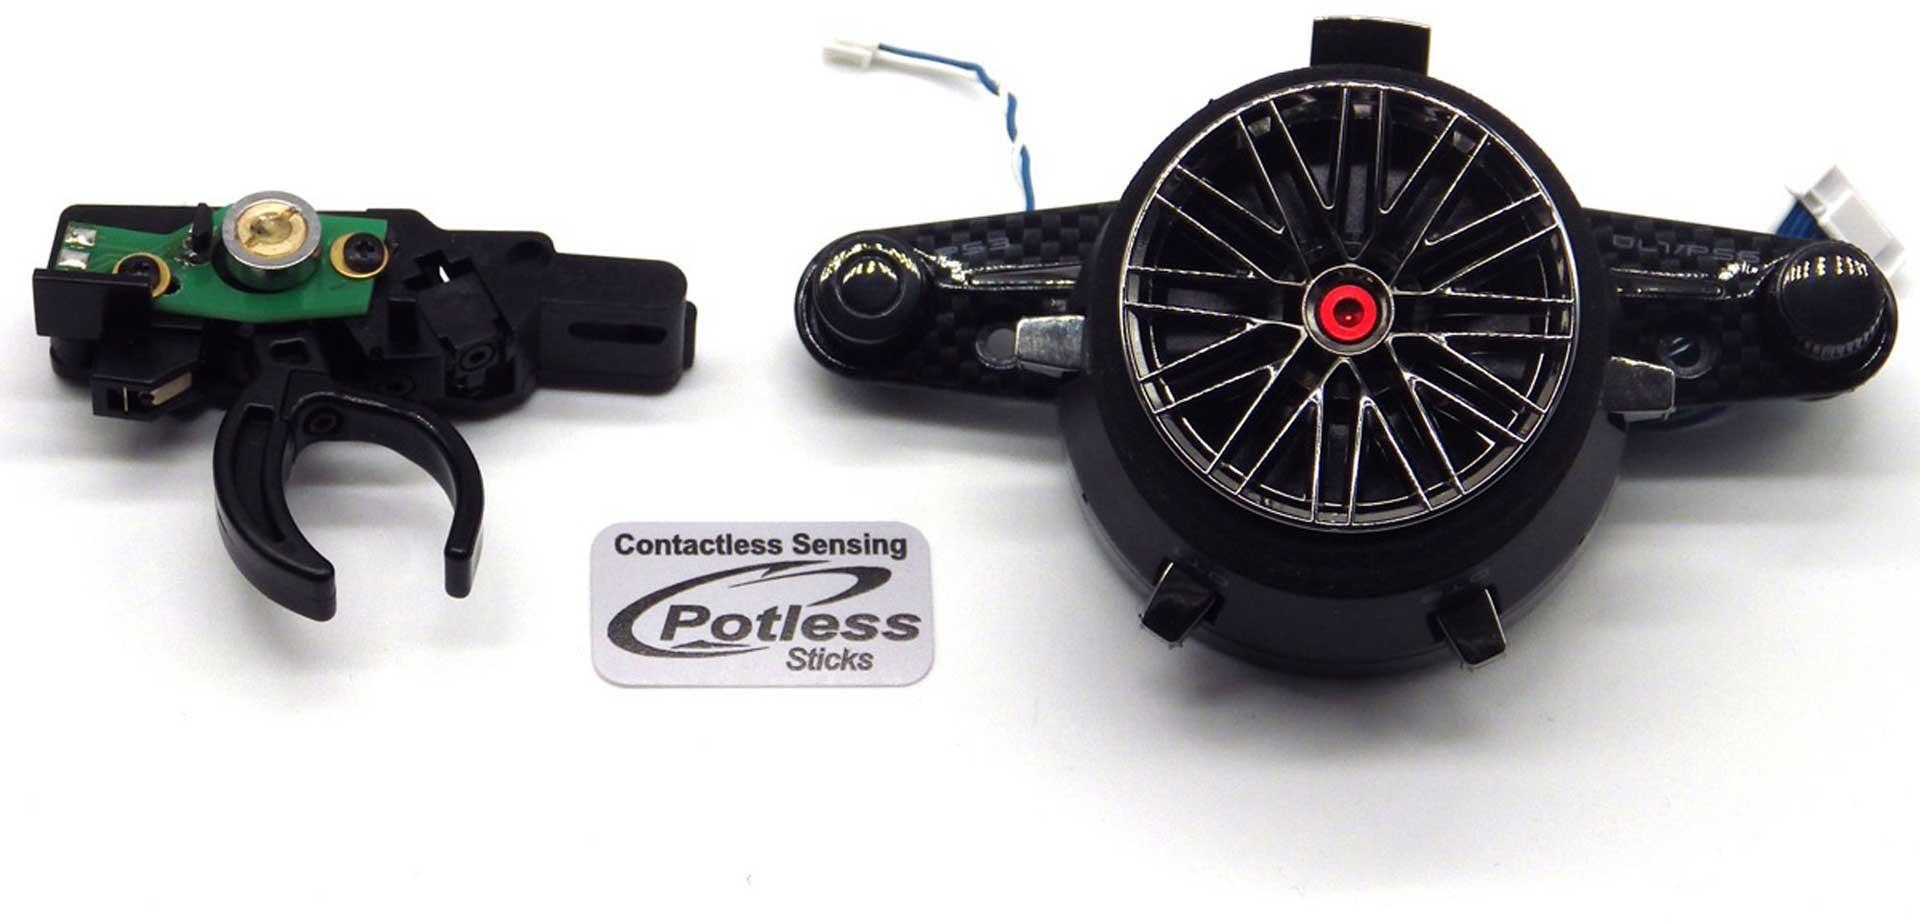 Futaba T7PXR Potless 2,4Ghz Fernsteuerung V3 + R334SBS + LiPo 2800mAh + Lader